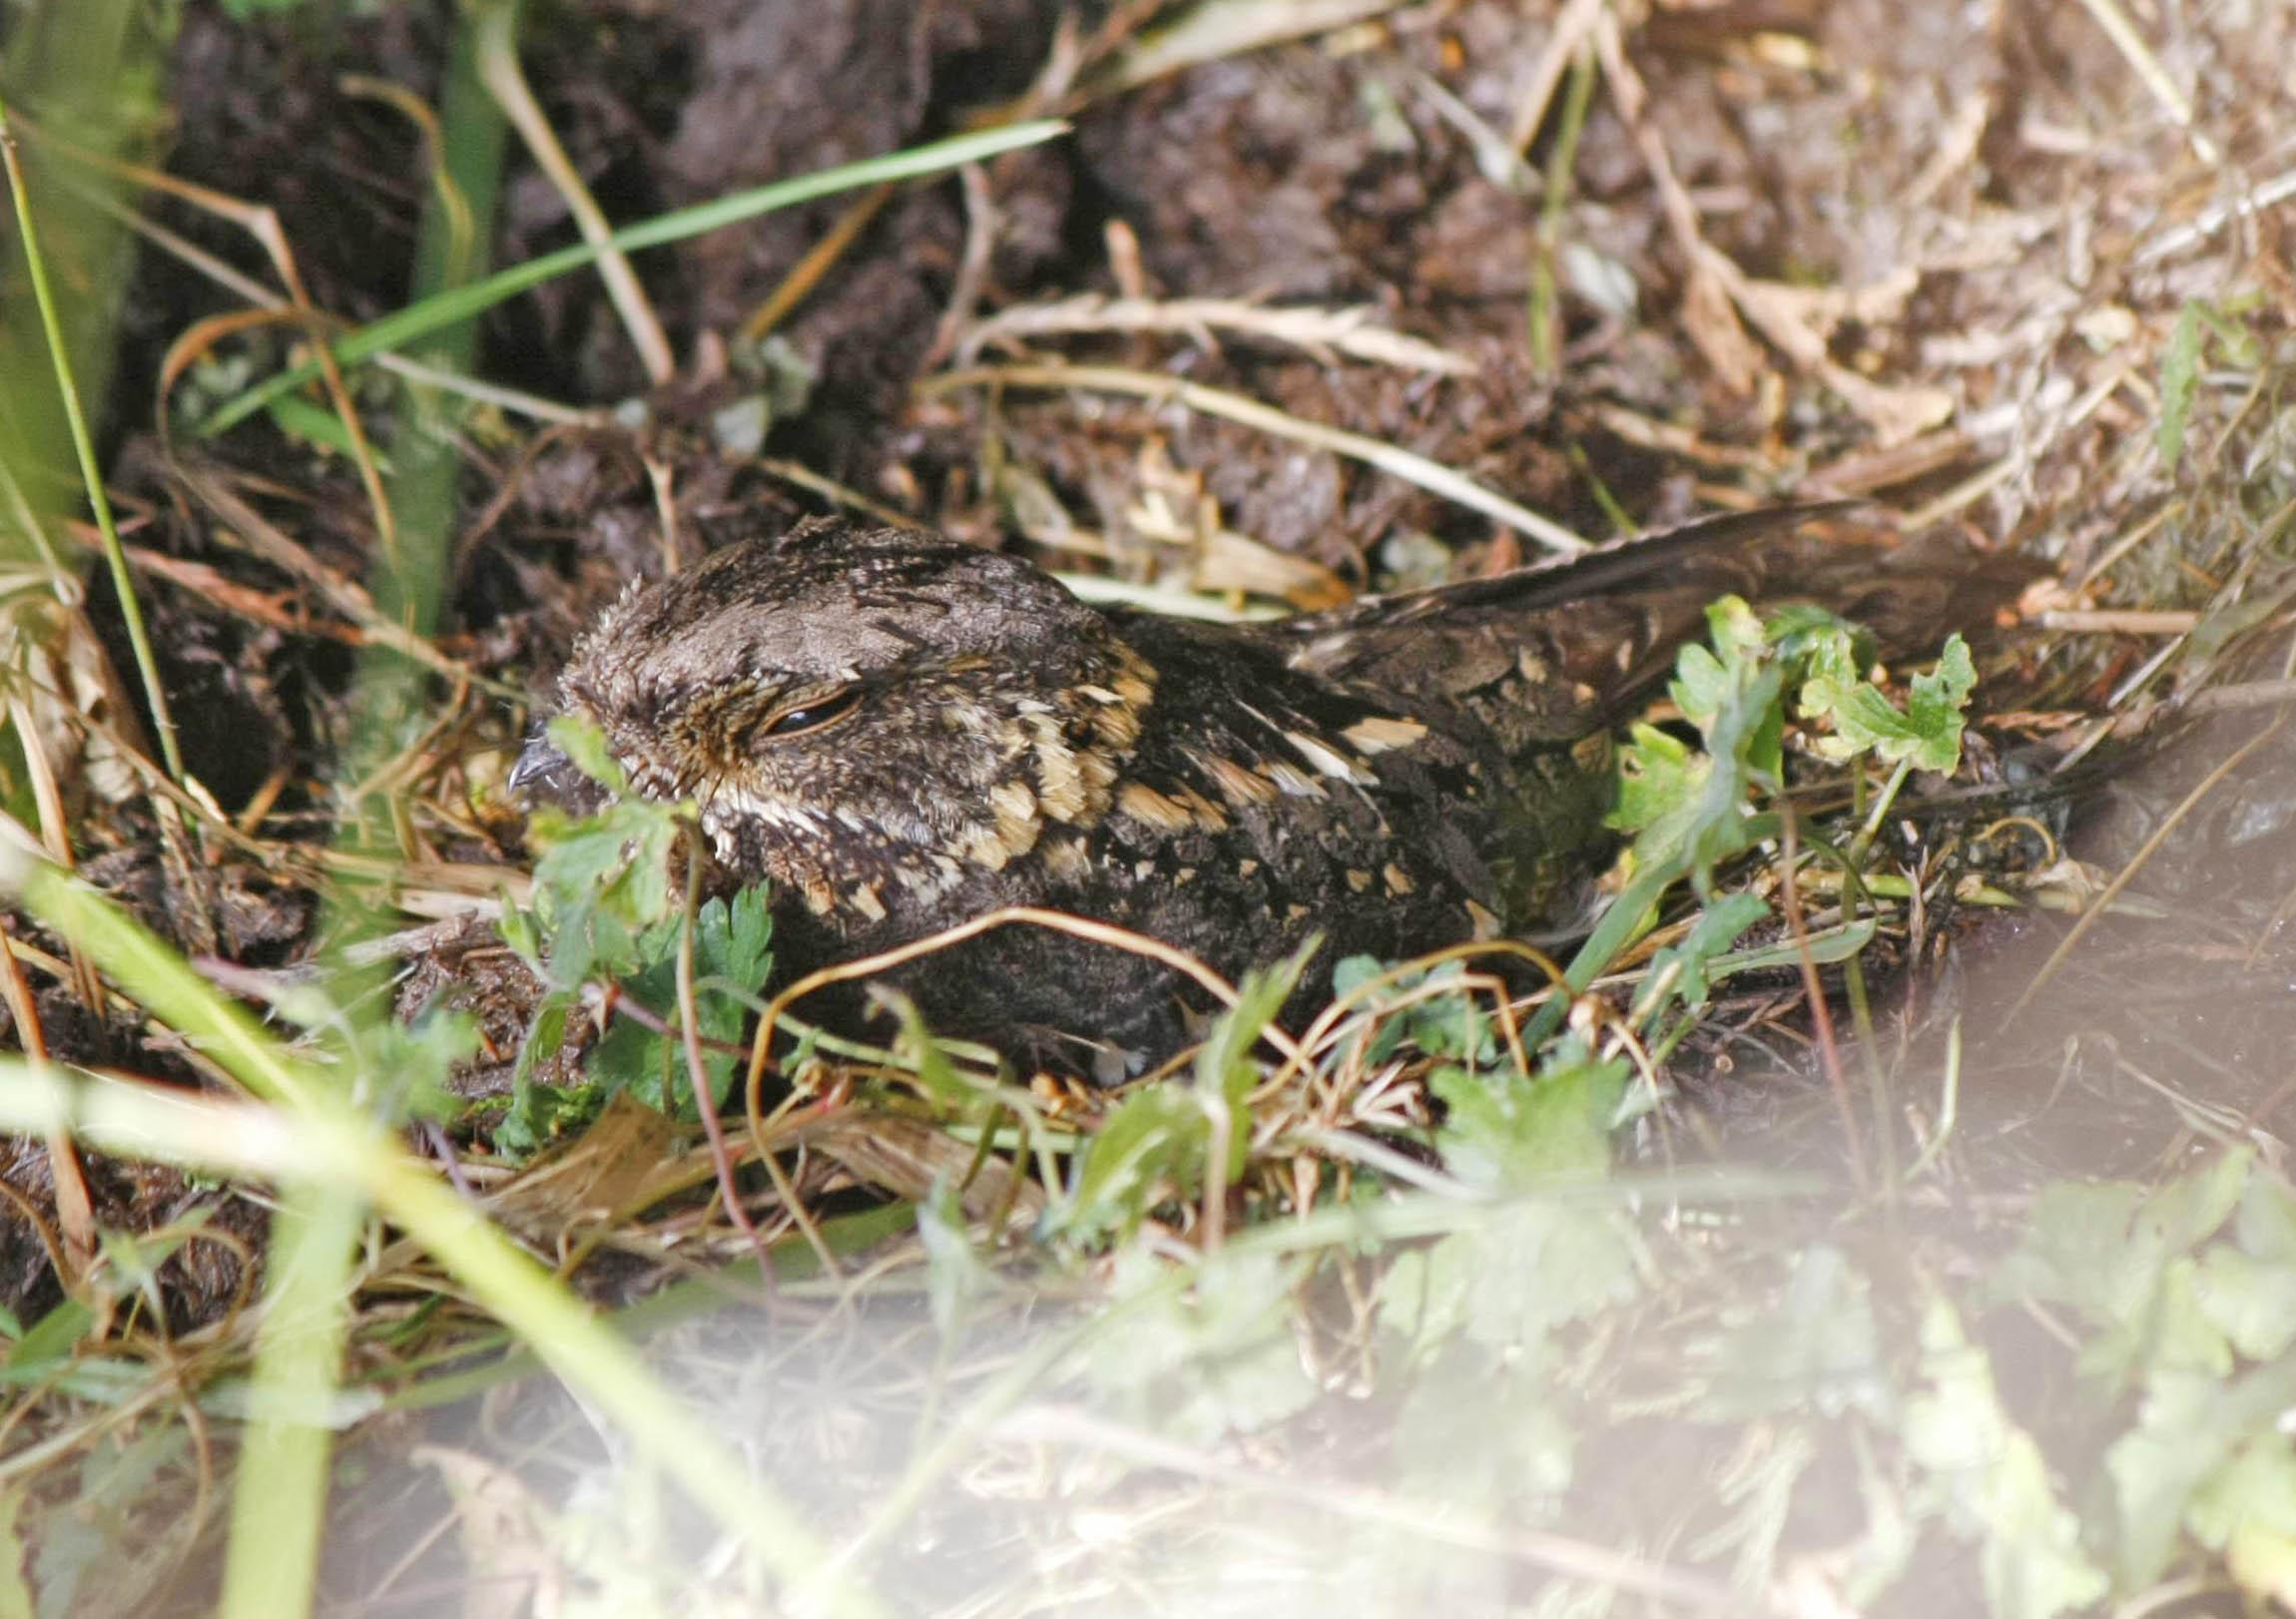 Abyssinian Nightjar in the grass